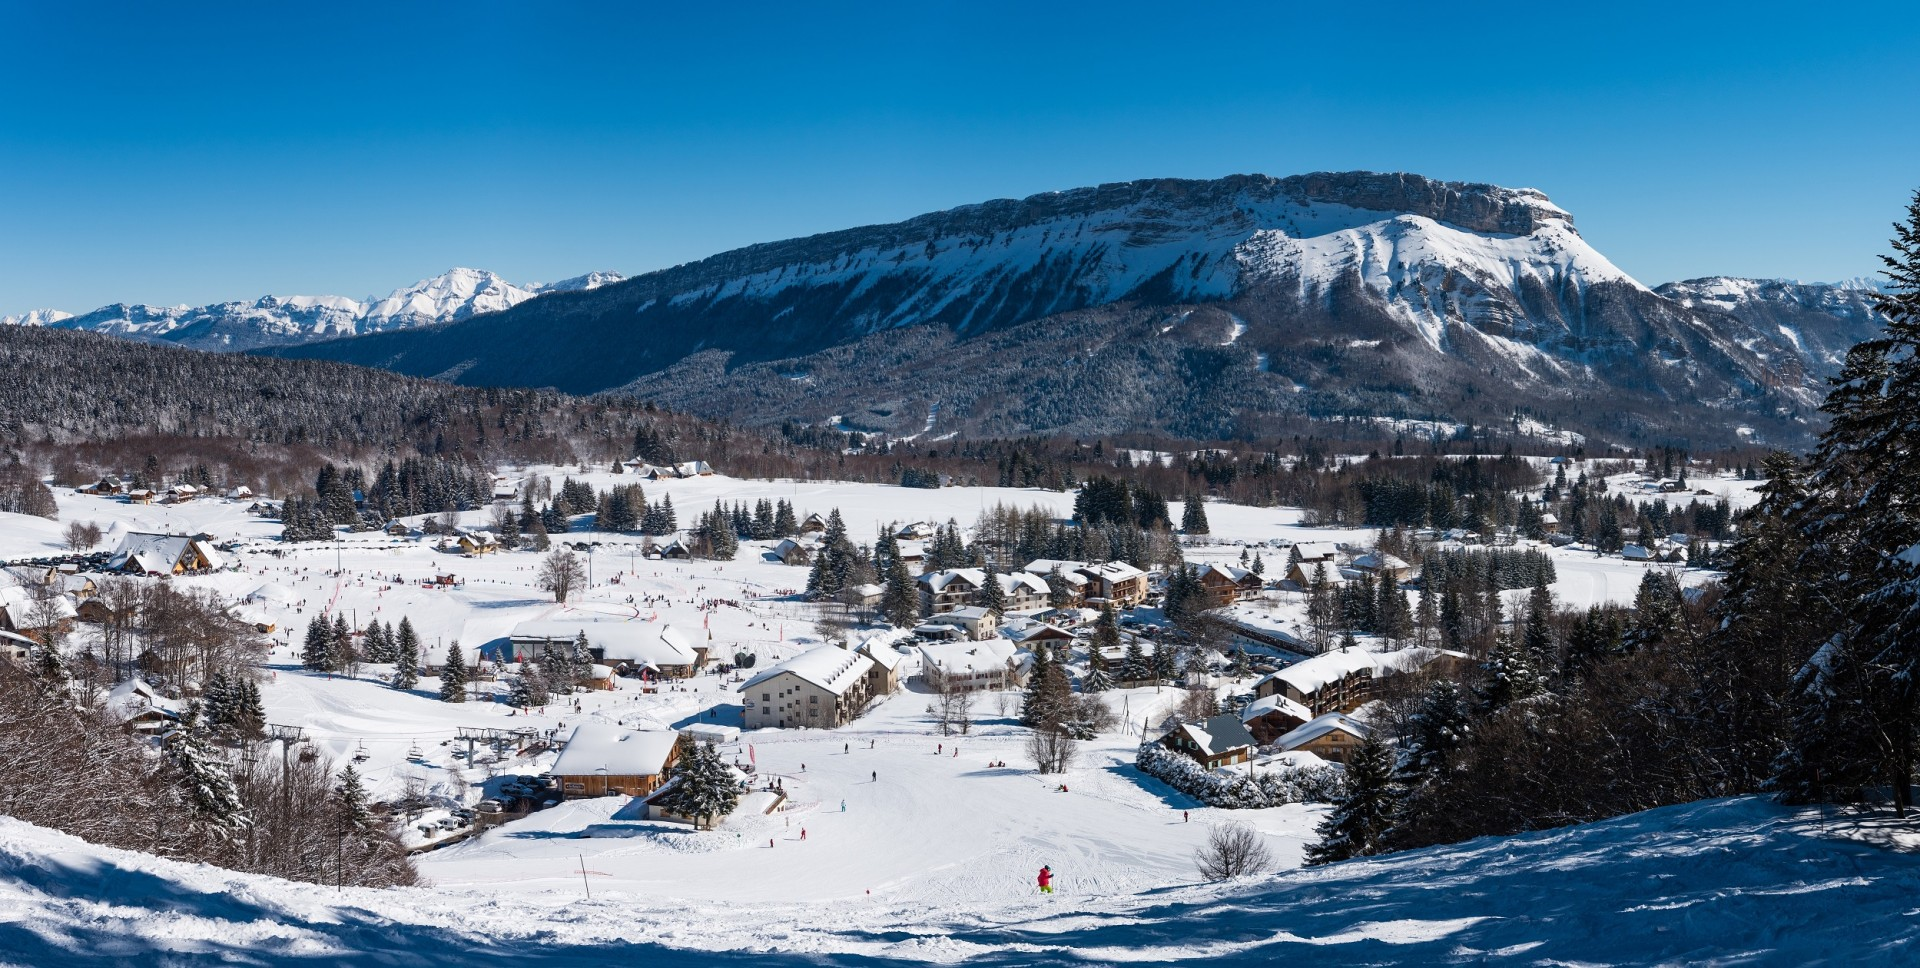 ski-alpin-famille-2018-la-feclaz-hd-savoie-grand-revard-peignee-verticale-t-nalet-437